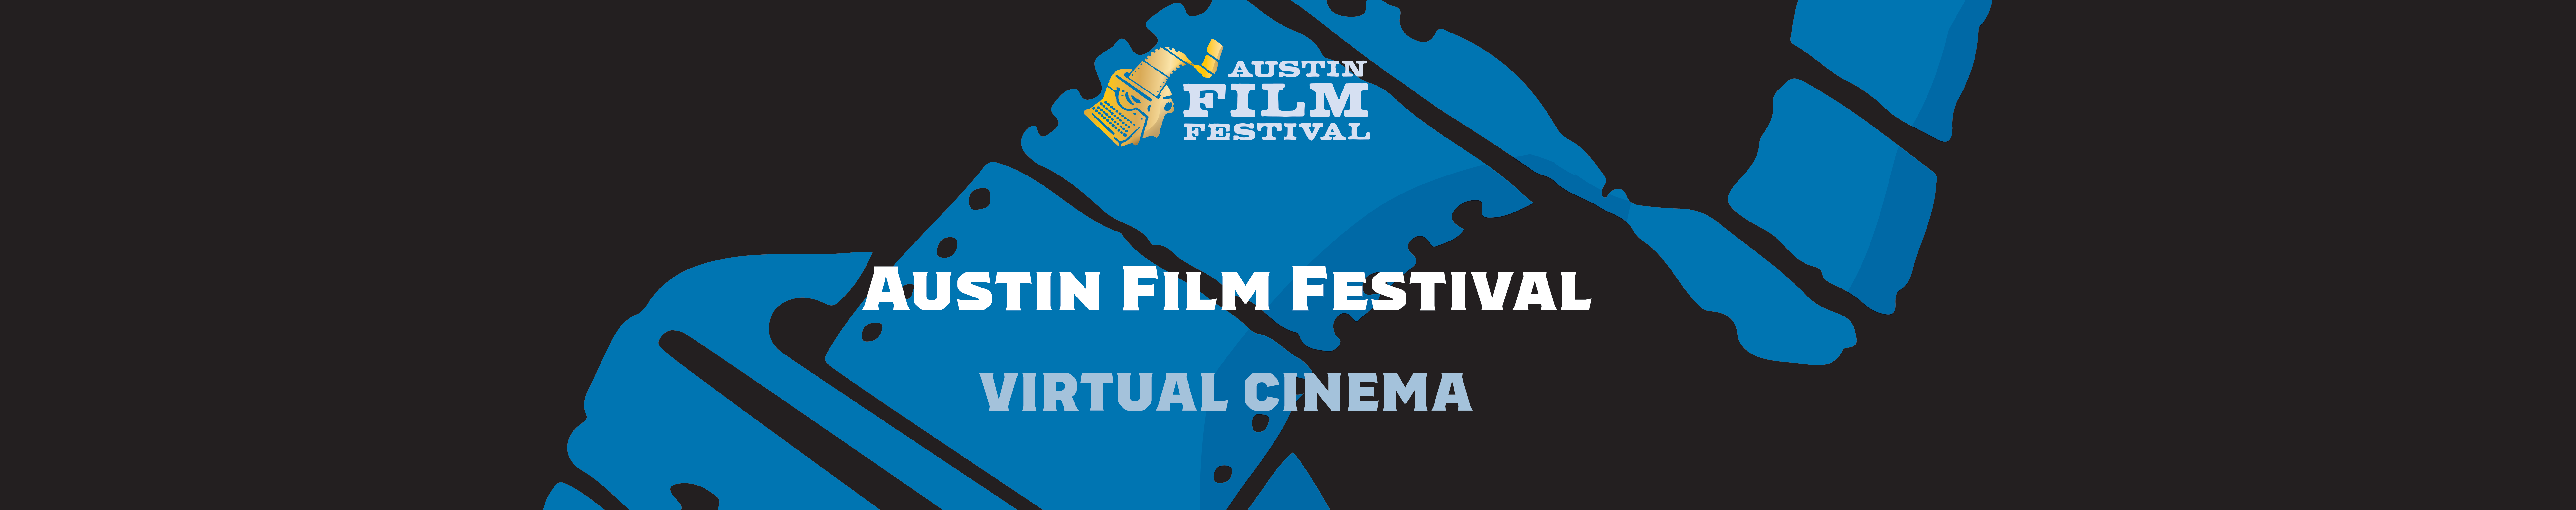 Austin Film Festival Virtual Cinema